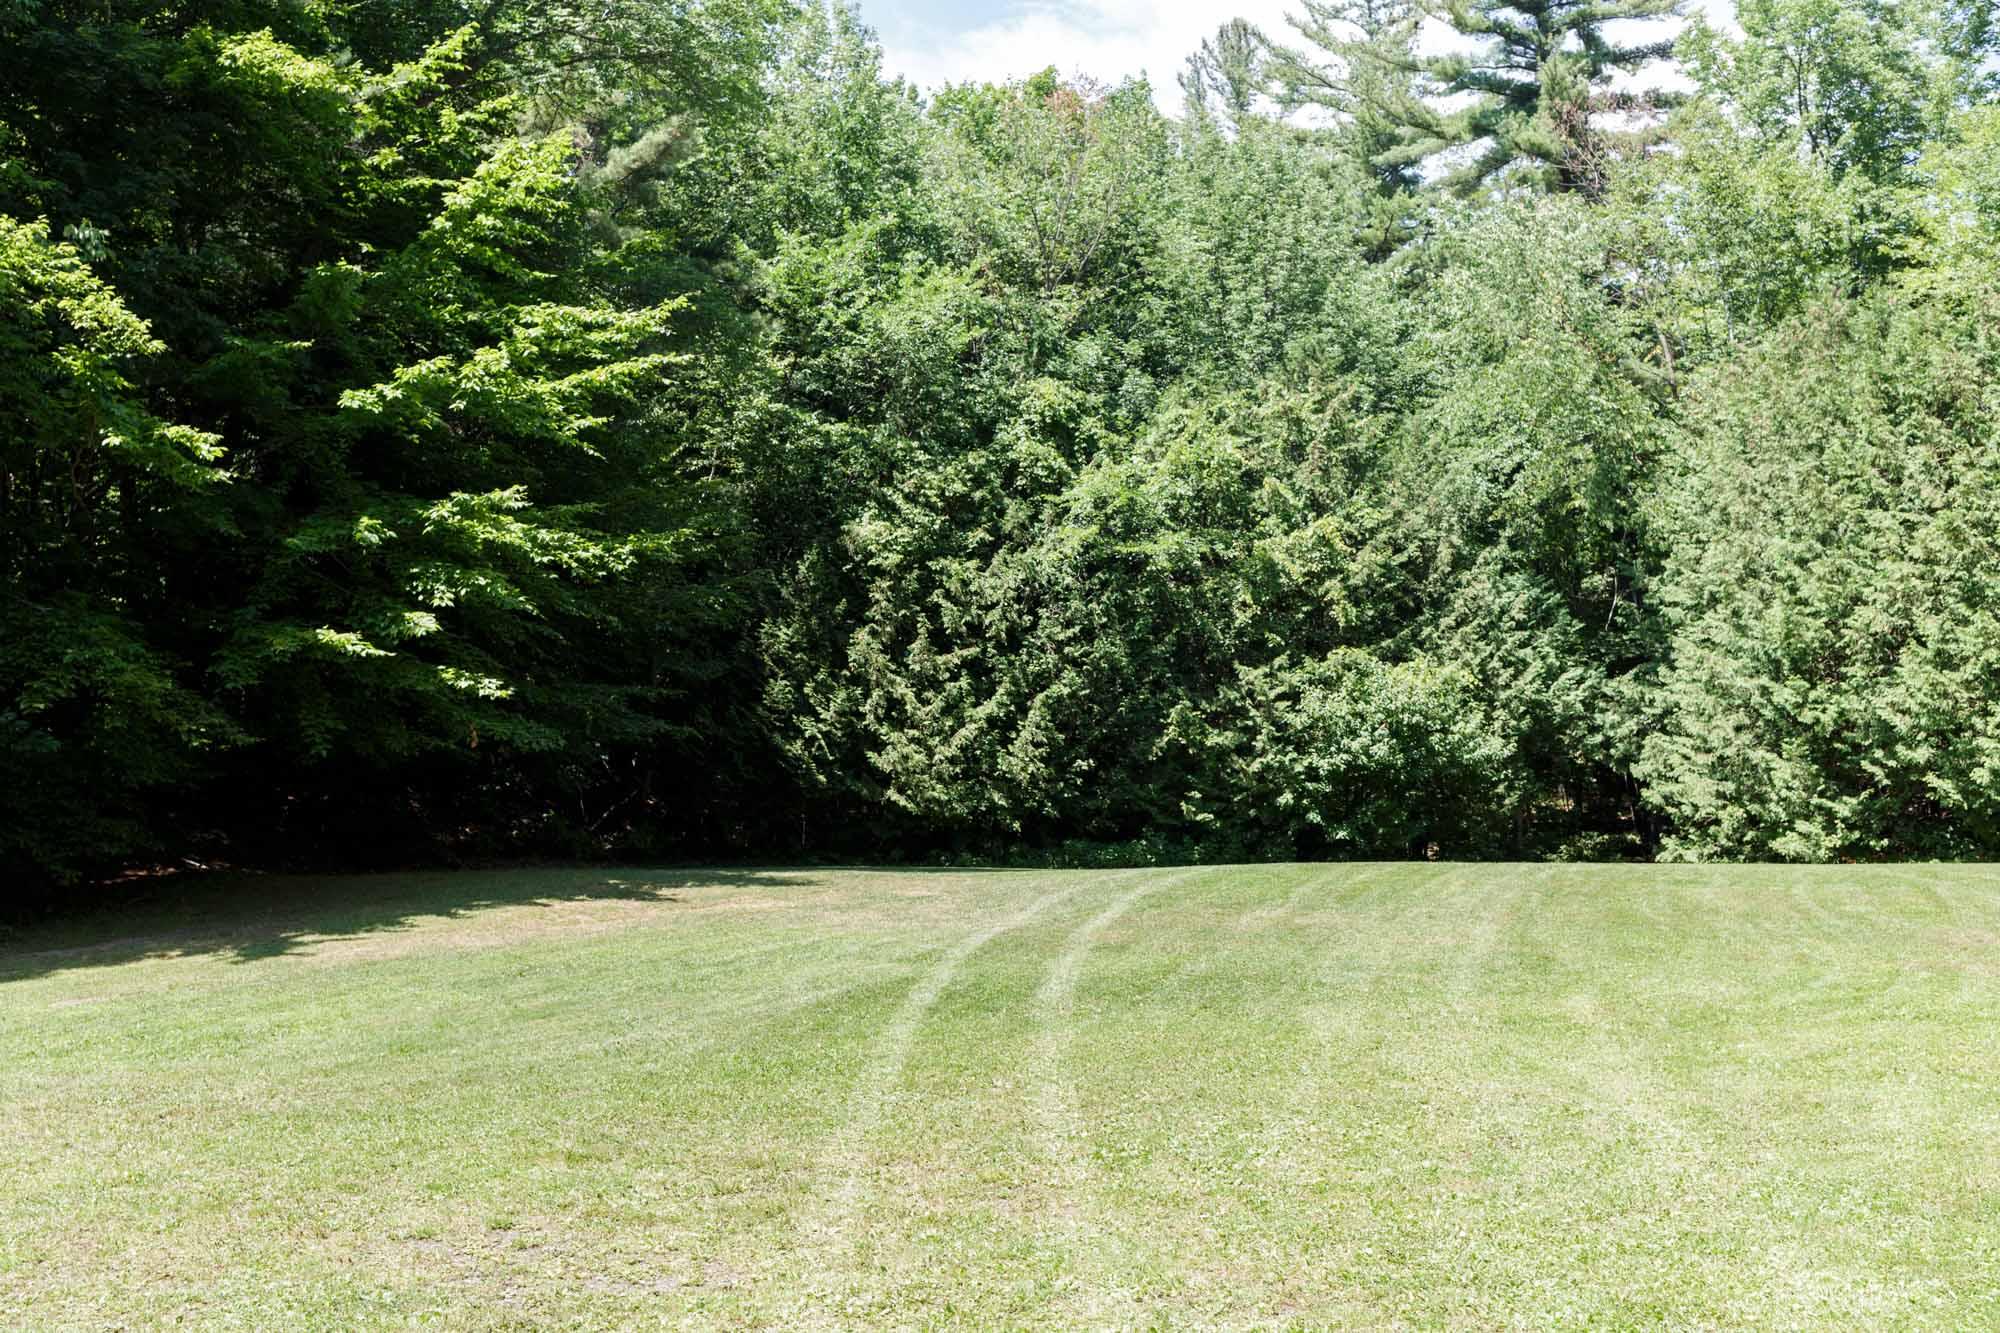 Tracks on Grass